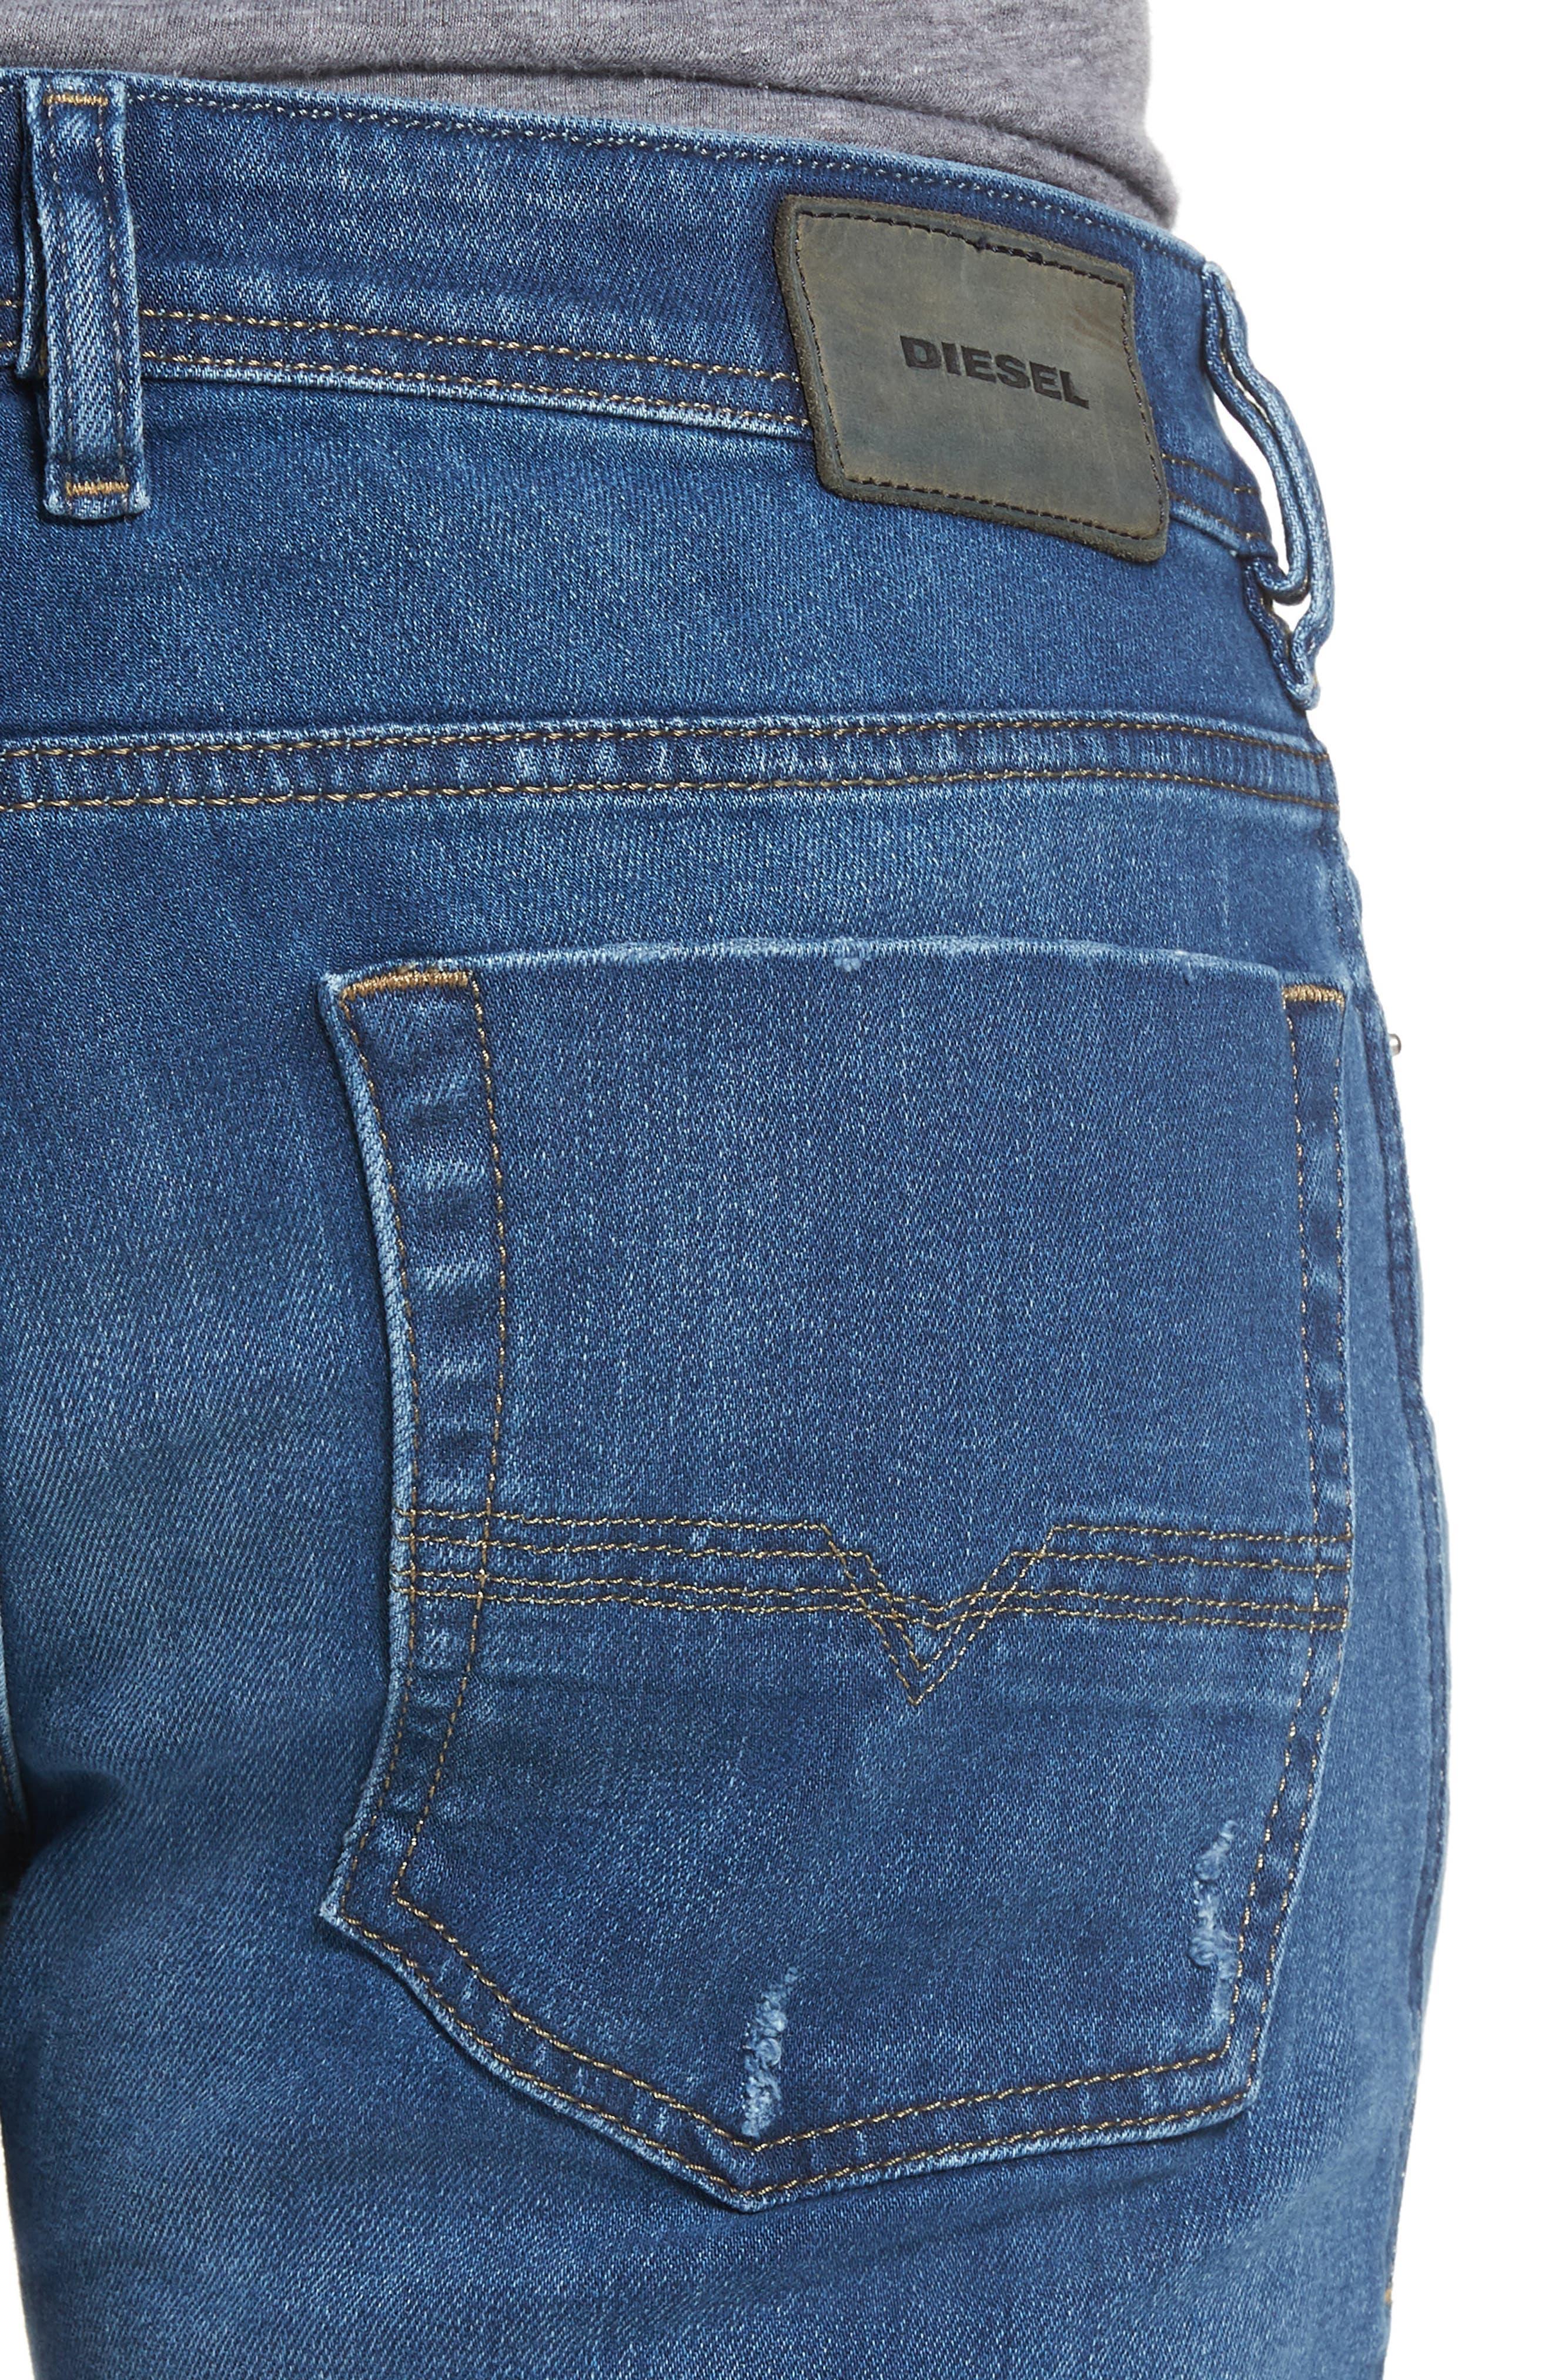 Zatiny Bootcut Jeans,                             Alternate thumbnail 4, color,                             084Qq